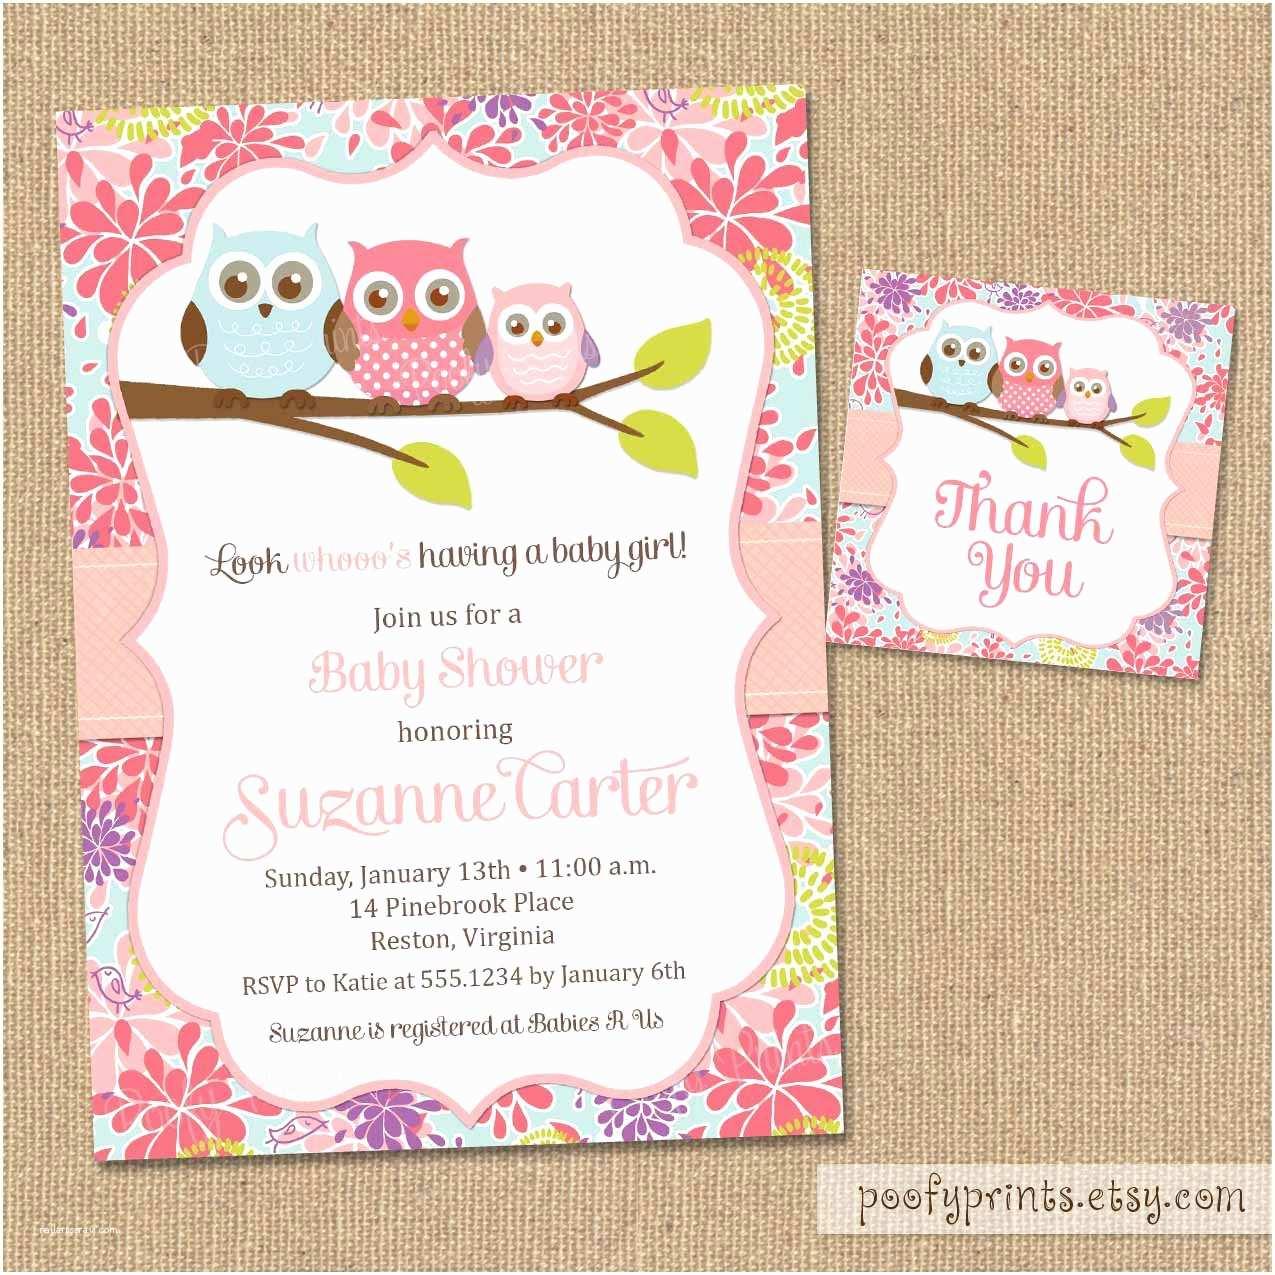 Make Baby Shower Invitations Online Free Printable Girl Baby Shower Invitations